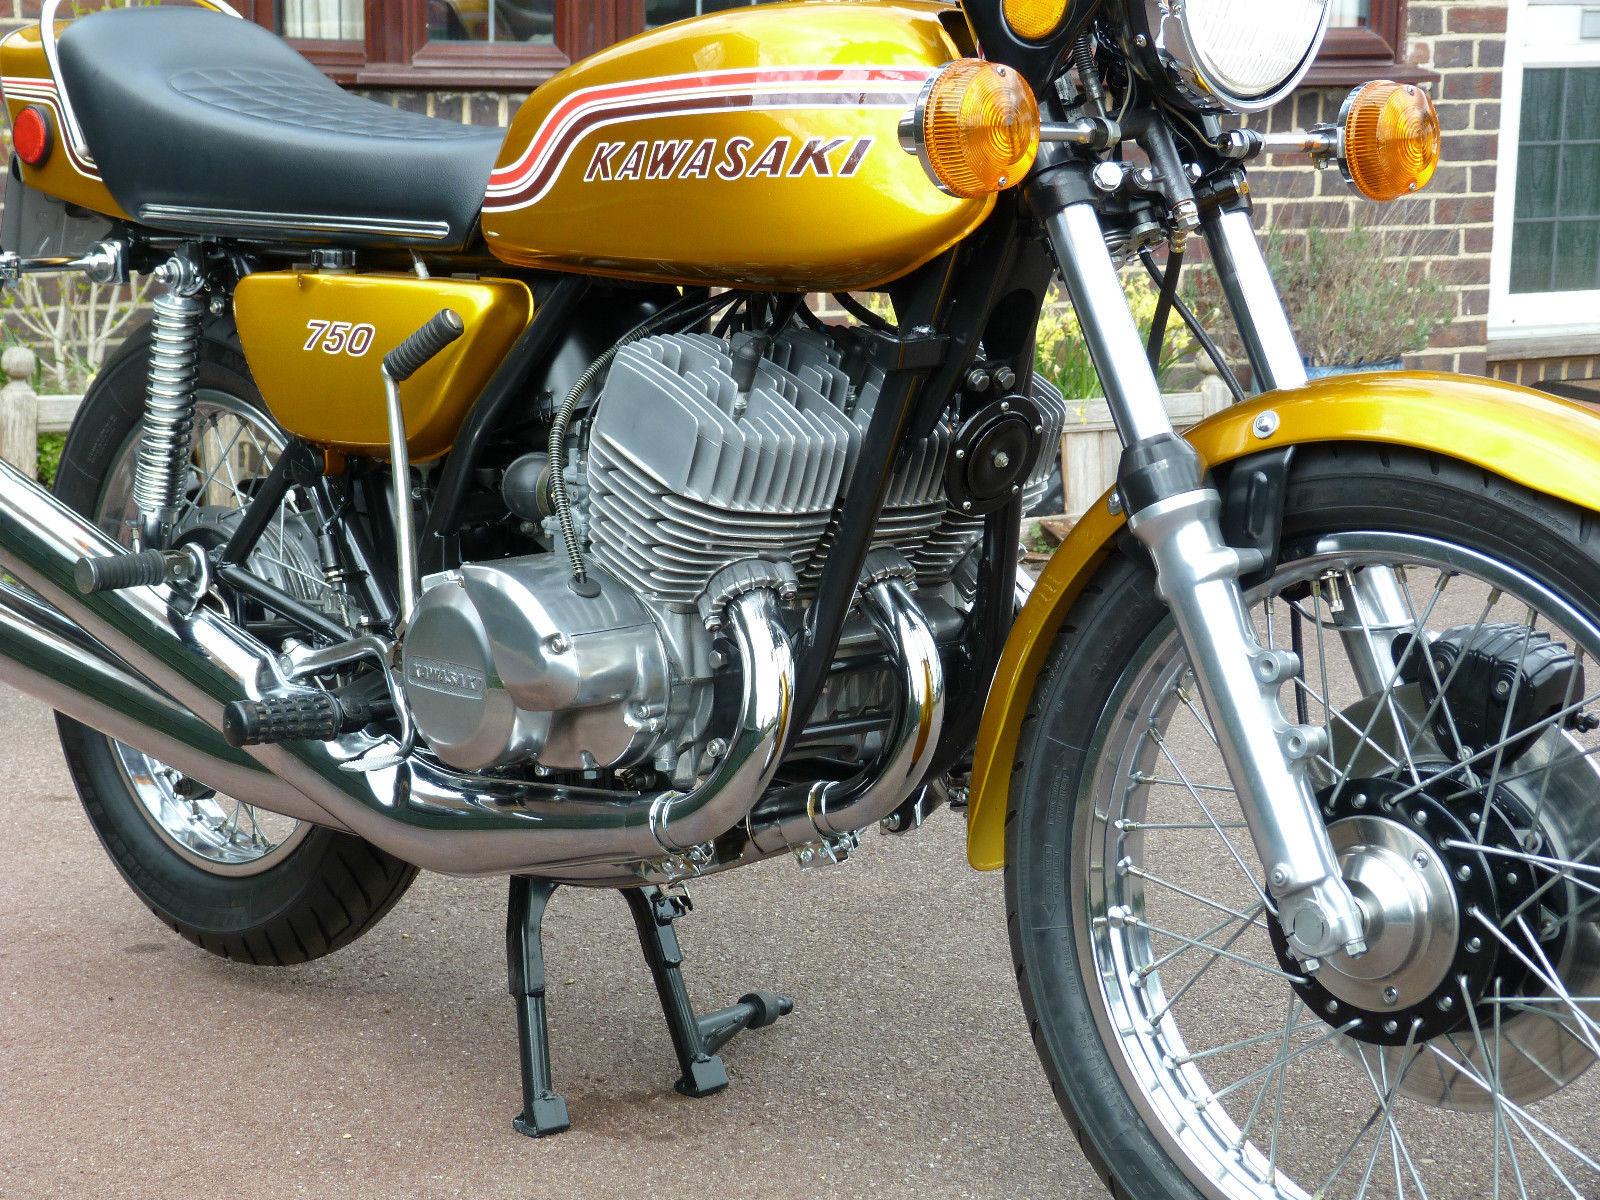 Kawasaki H2 750 - 1972 - Forks, Dust Covers, Front Wheel, Kick Start, Indicator, Main Stand and Reflector.